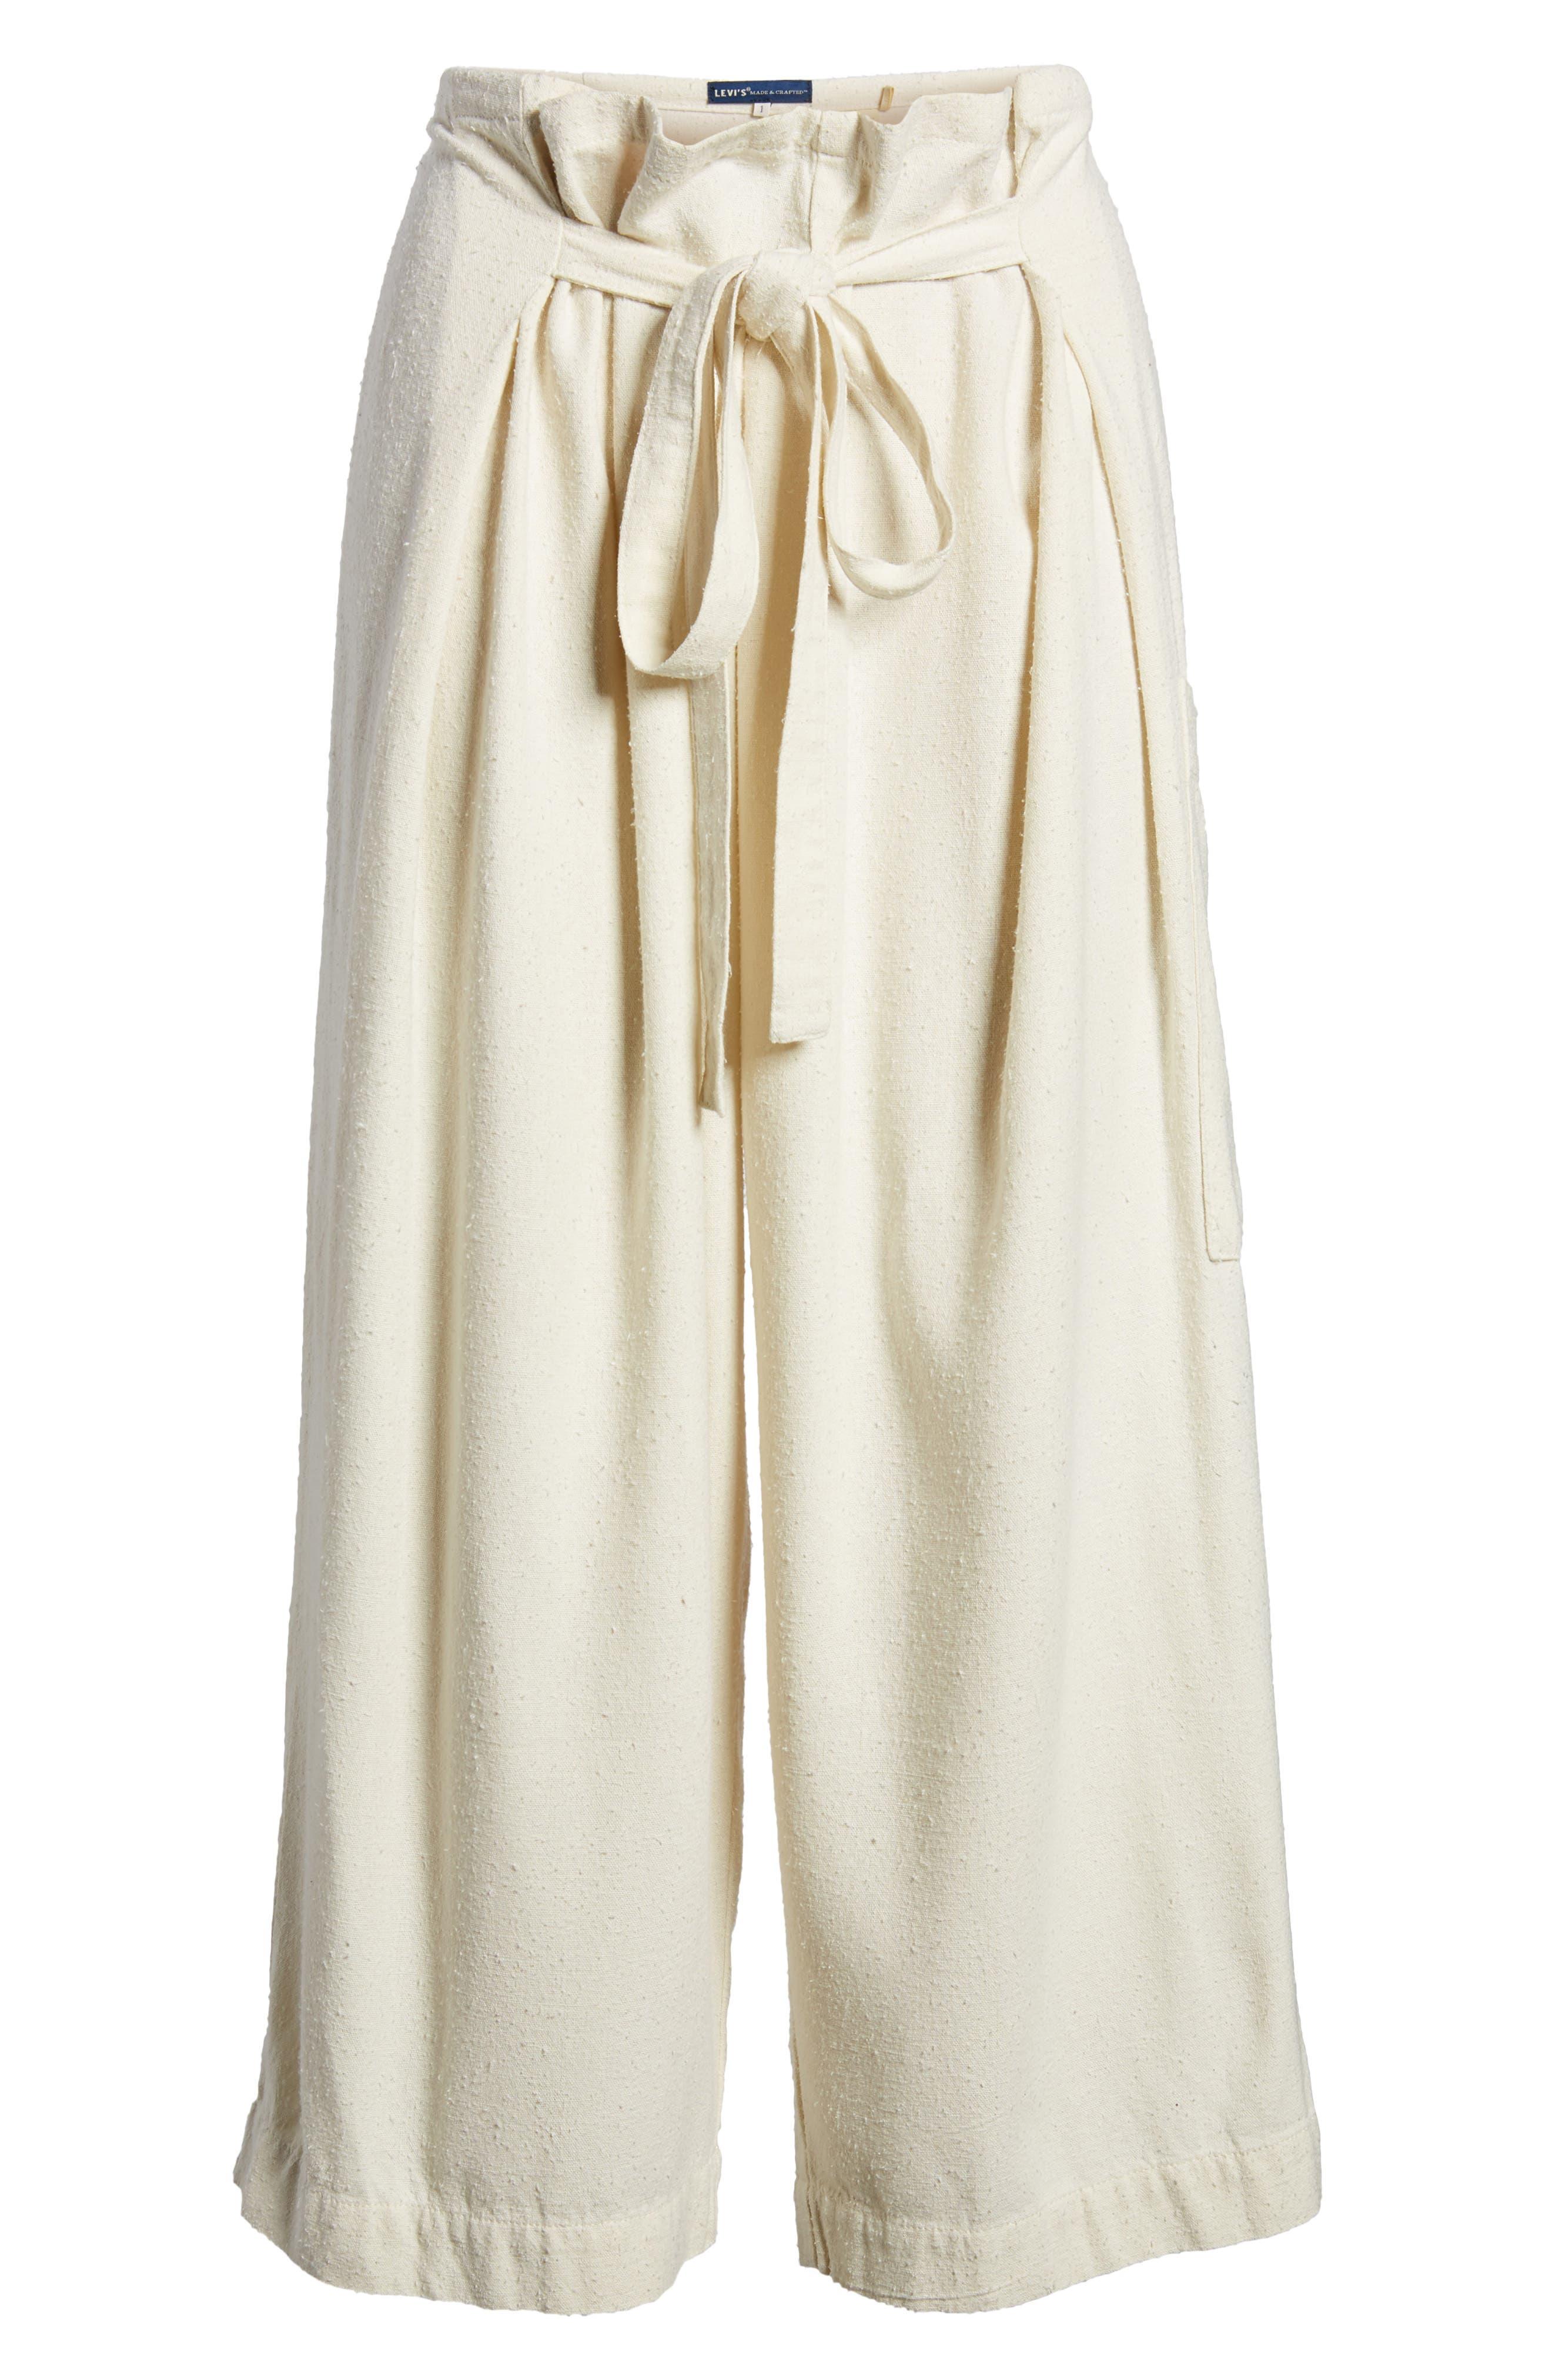 High Waist Crop Silk Beach Pants,                             Alternate thumbnail 7, color,                             Pristine